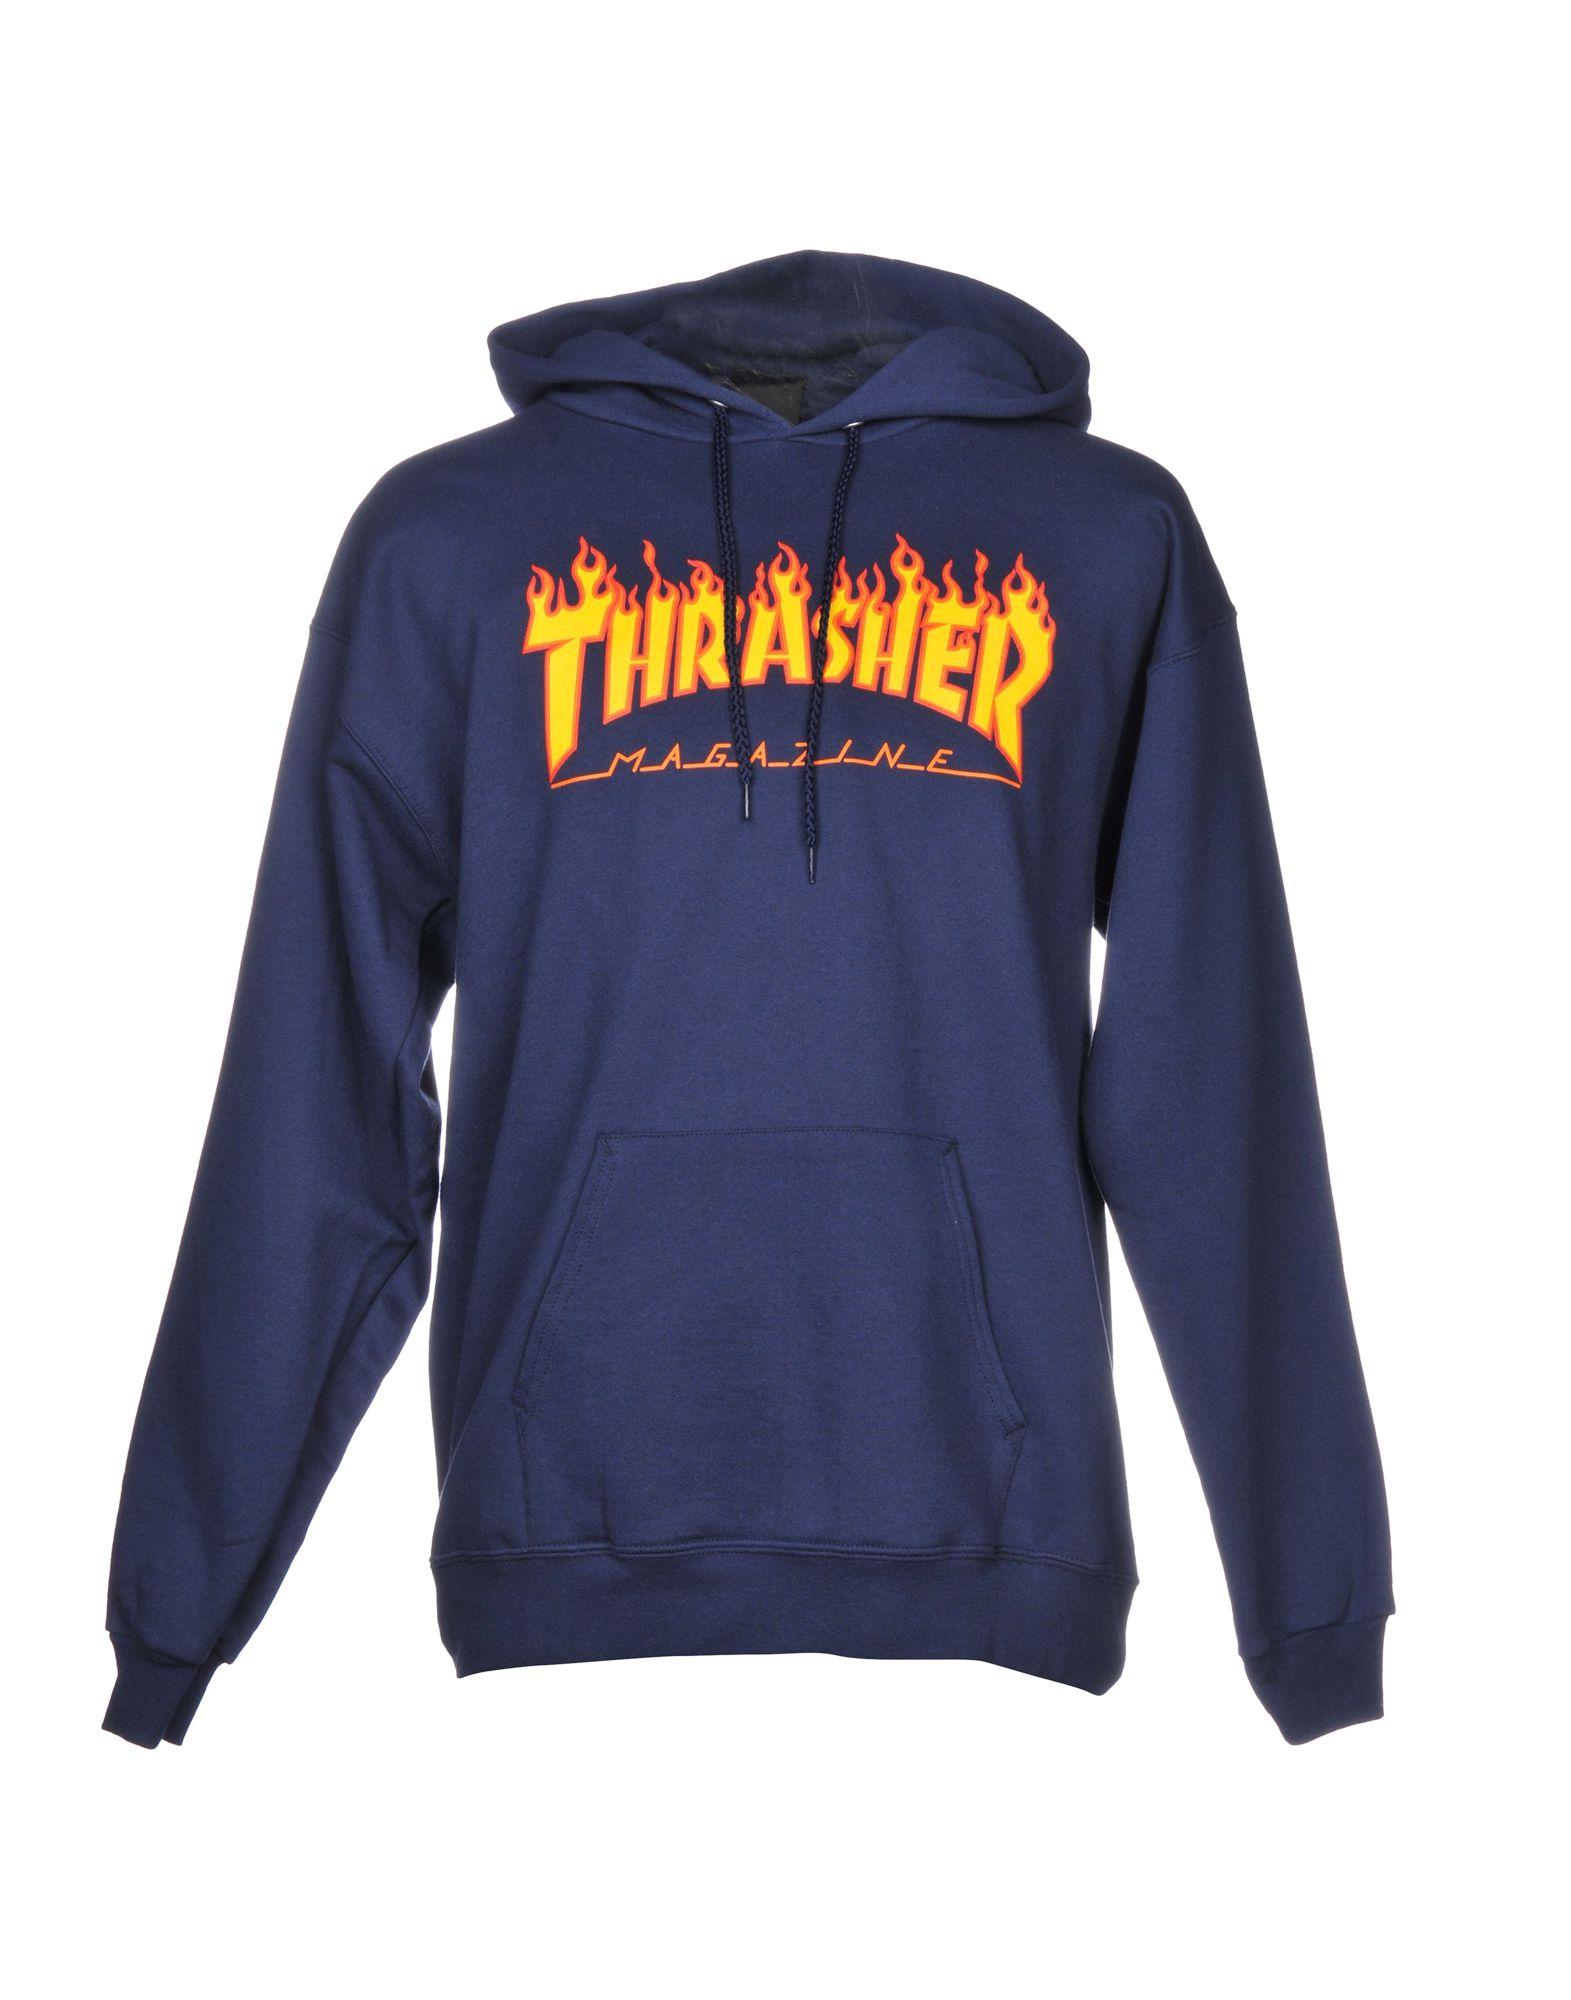 THRASHER Hooded Sweatshirt in Dark Blue